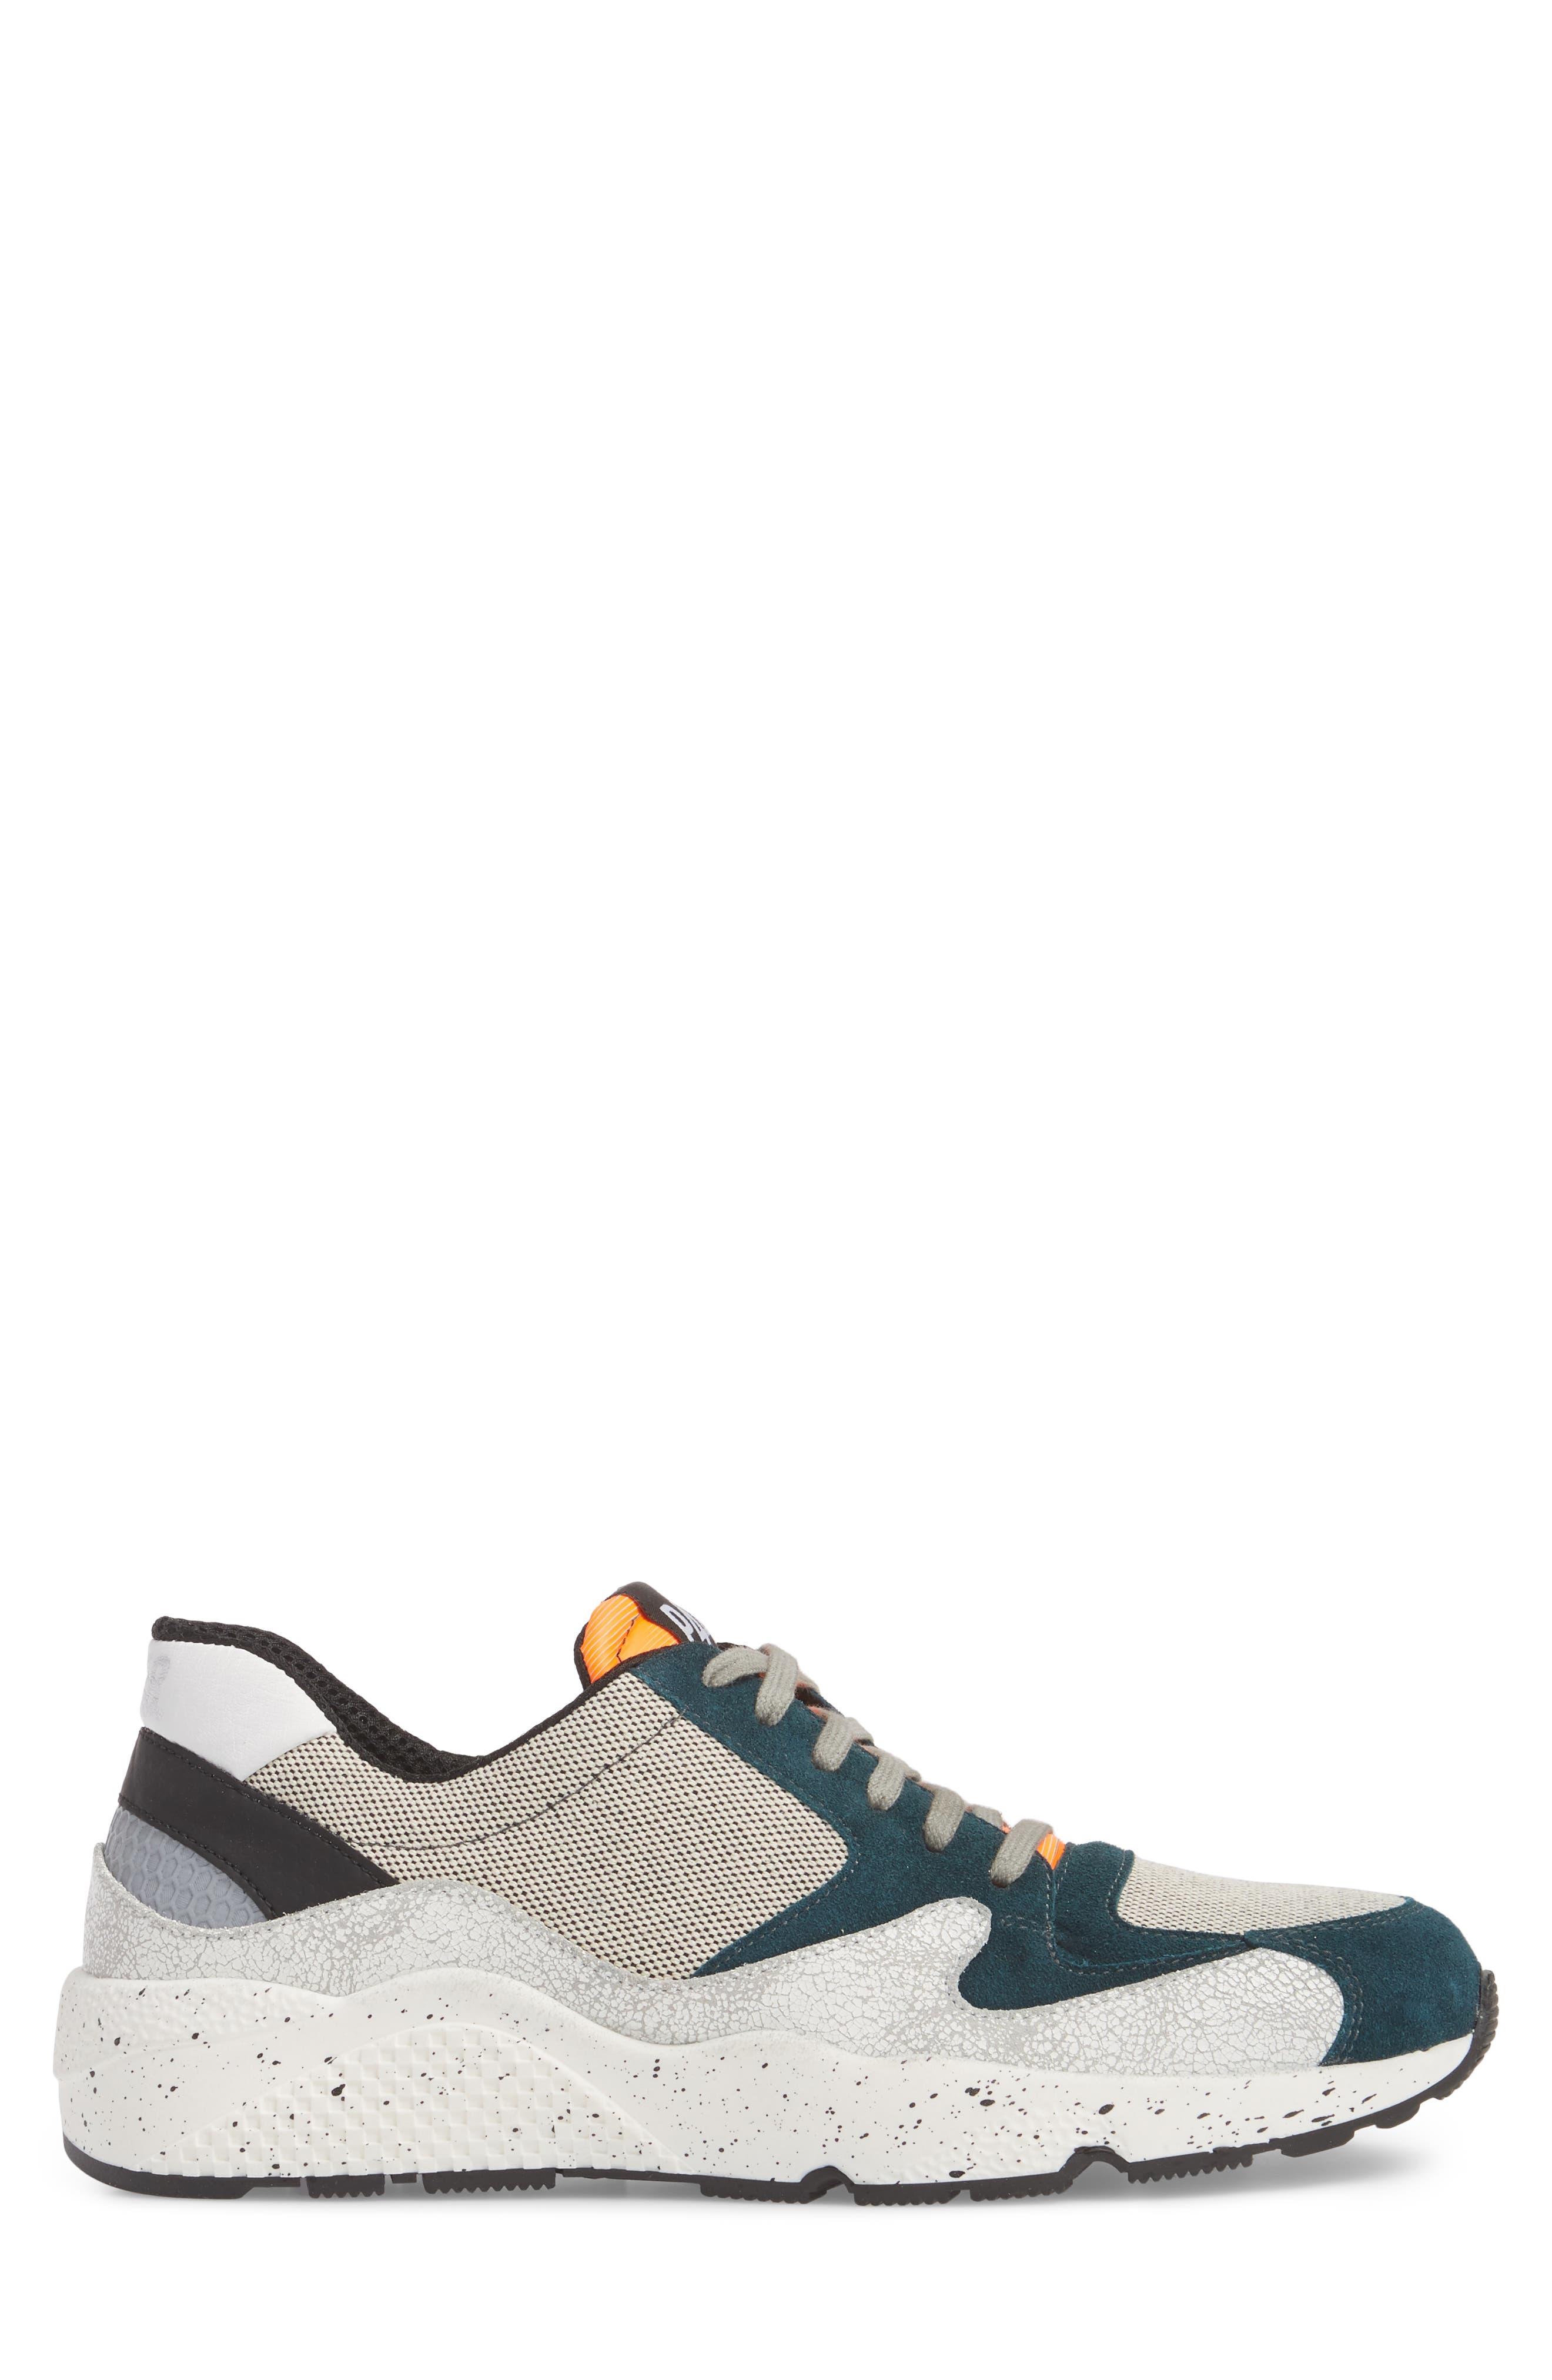 America Low Top Sneaker,                             Alternate thumbnail 3, color,                             White